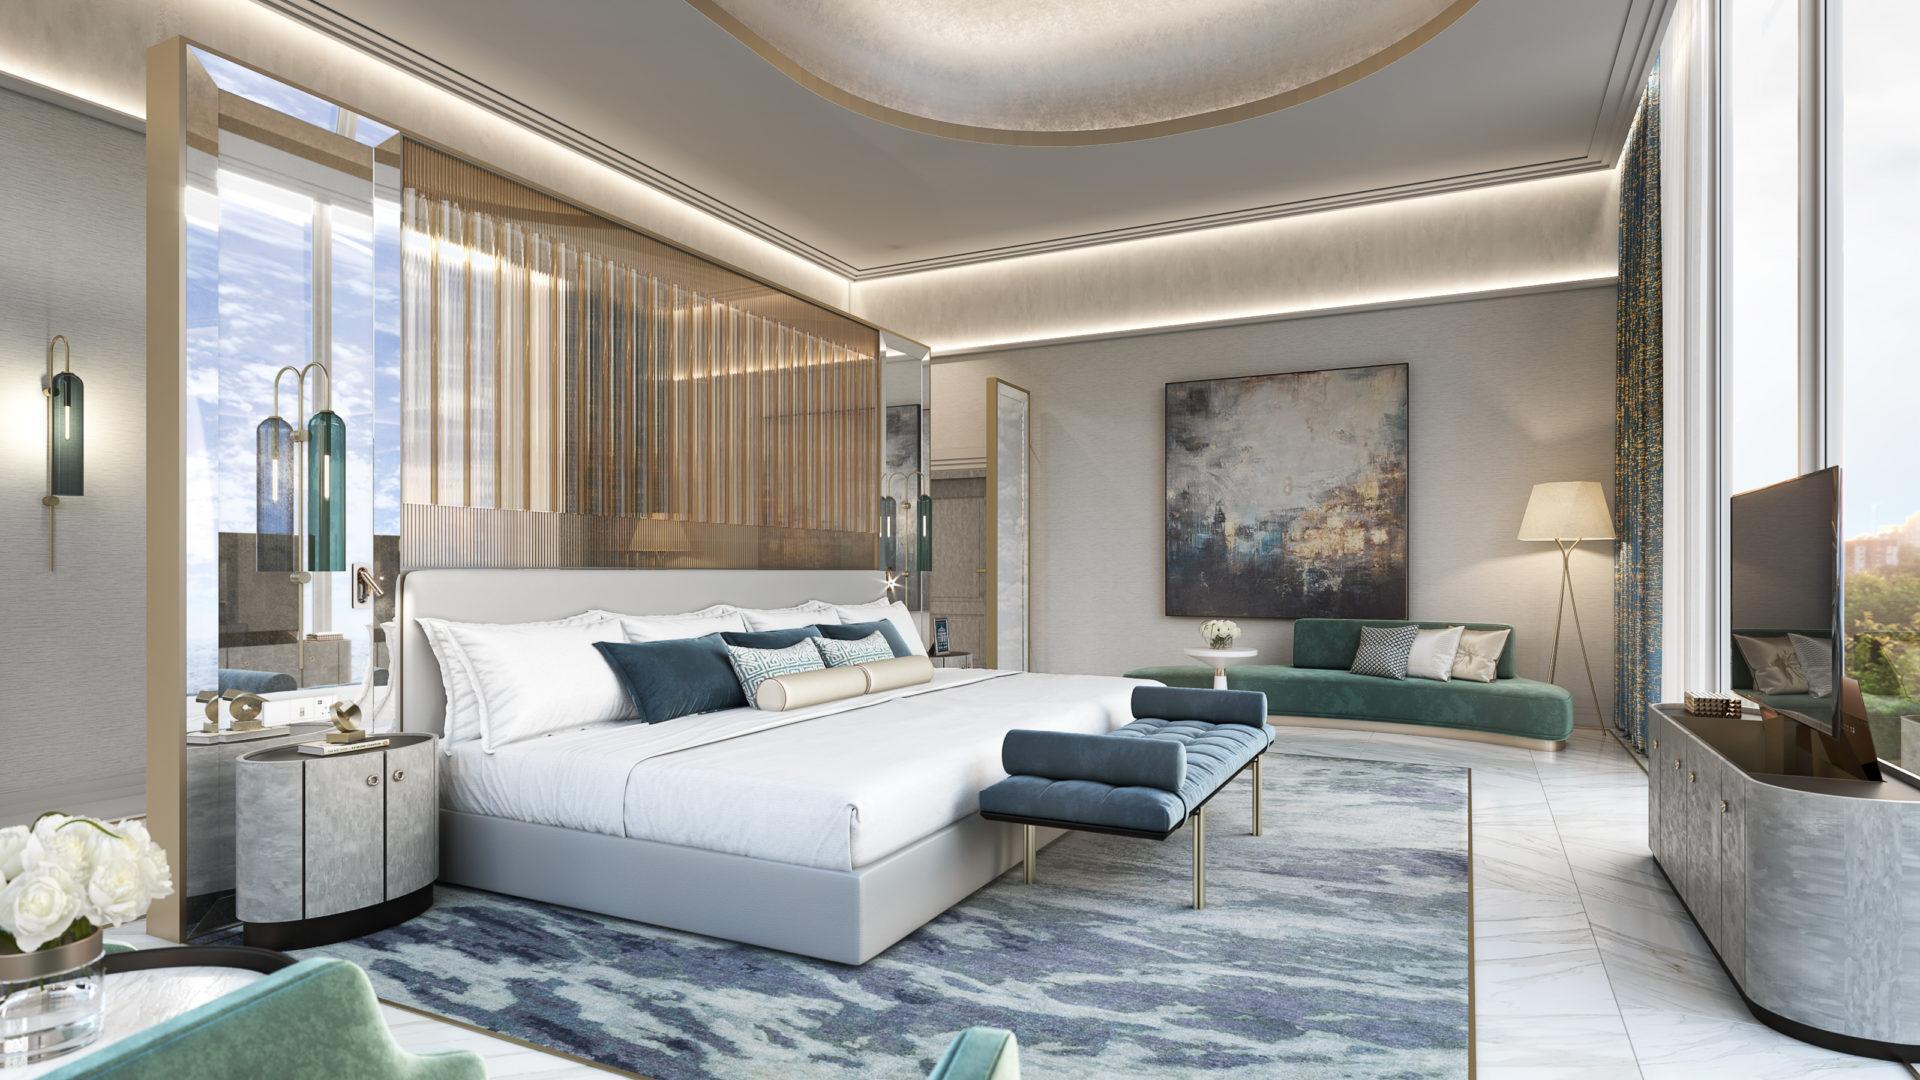 NJ_royal suite bedroom_190331